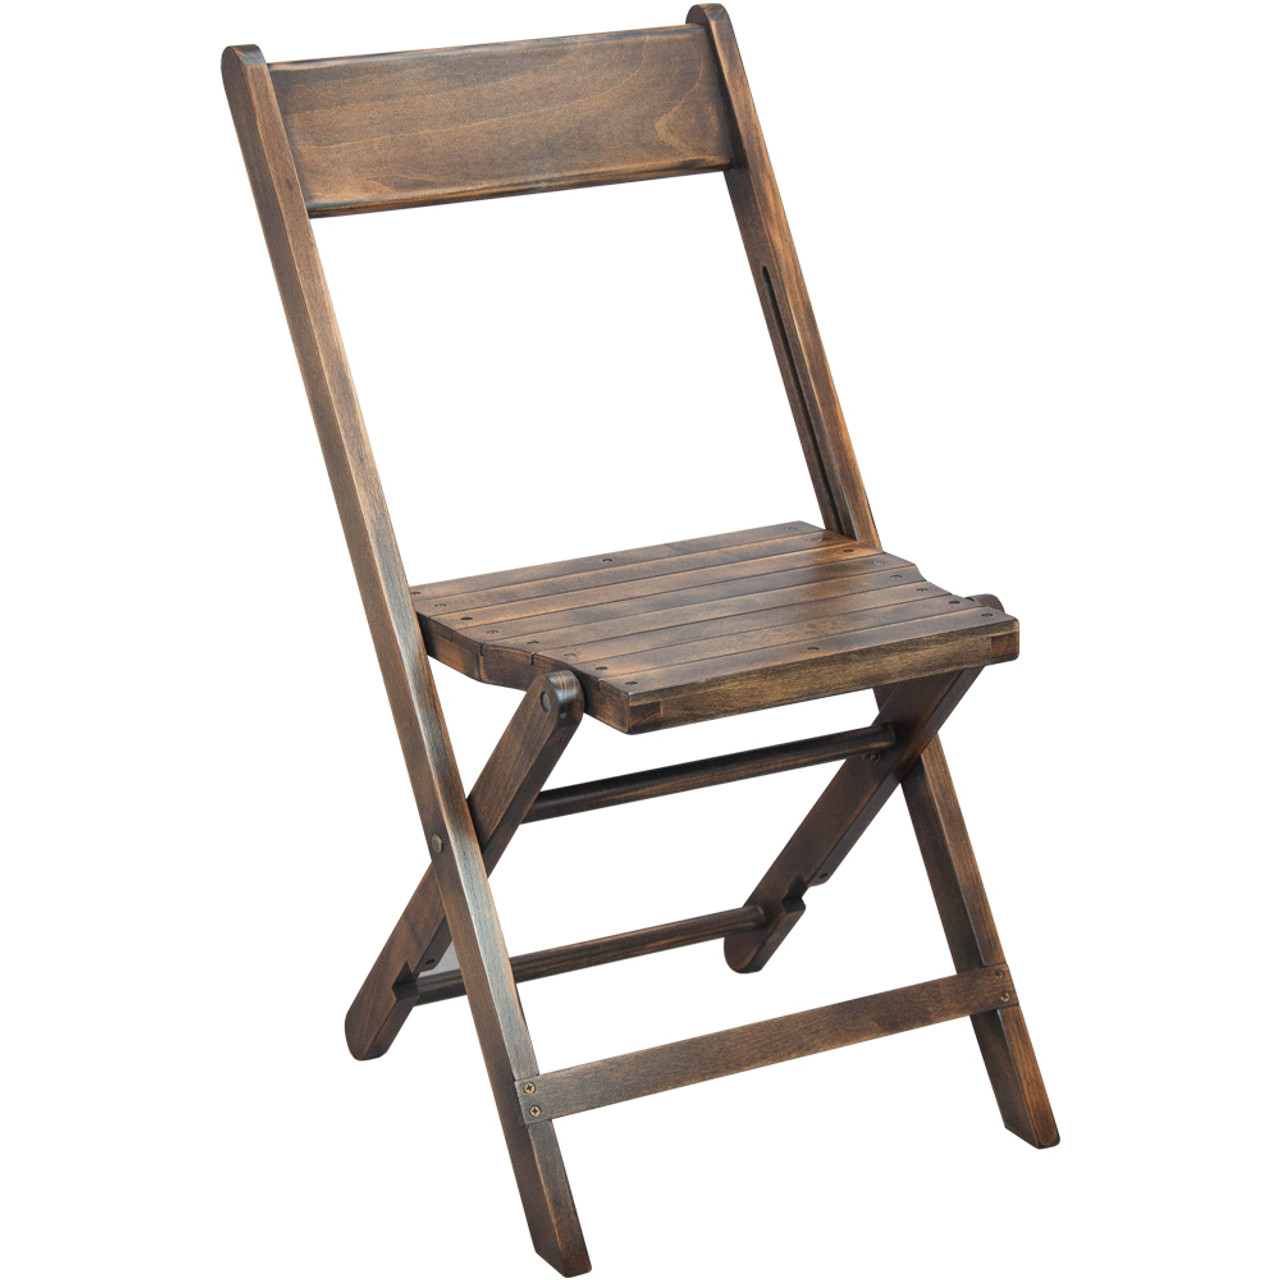 Tremendous Advantage Slatted Wood Folding Wedding Chair Antique Black Wfc Slat Ab Forskolin Free Trial Chair Design Images Forskolin Free Trialorg